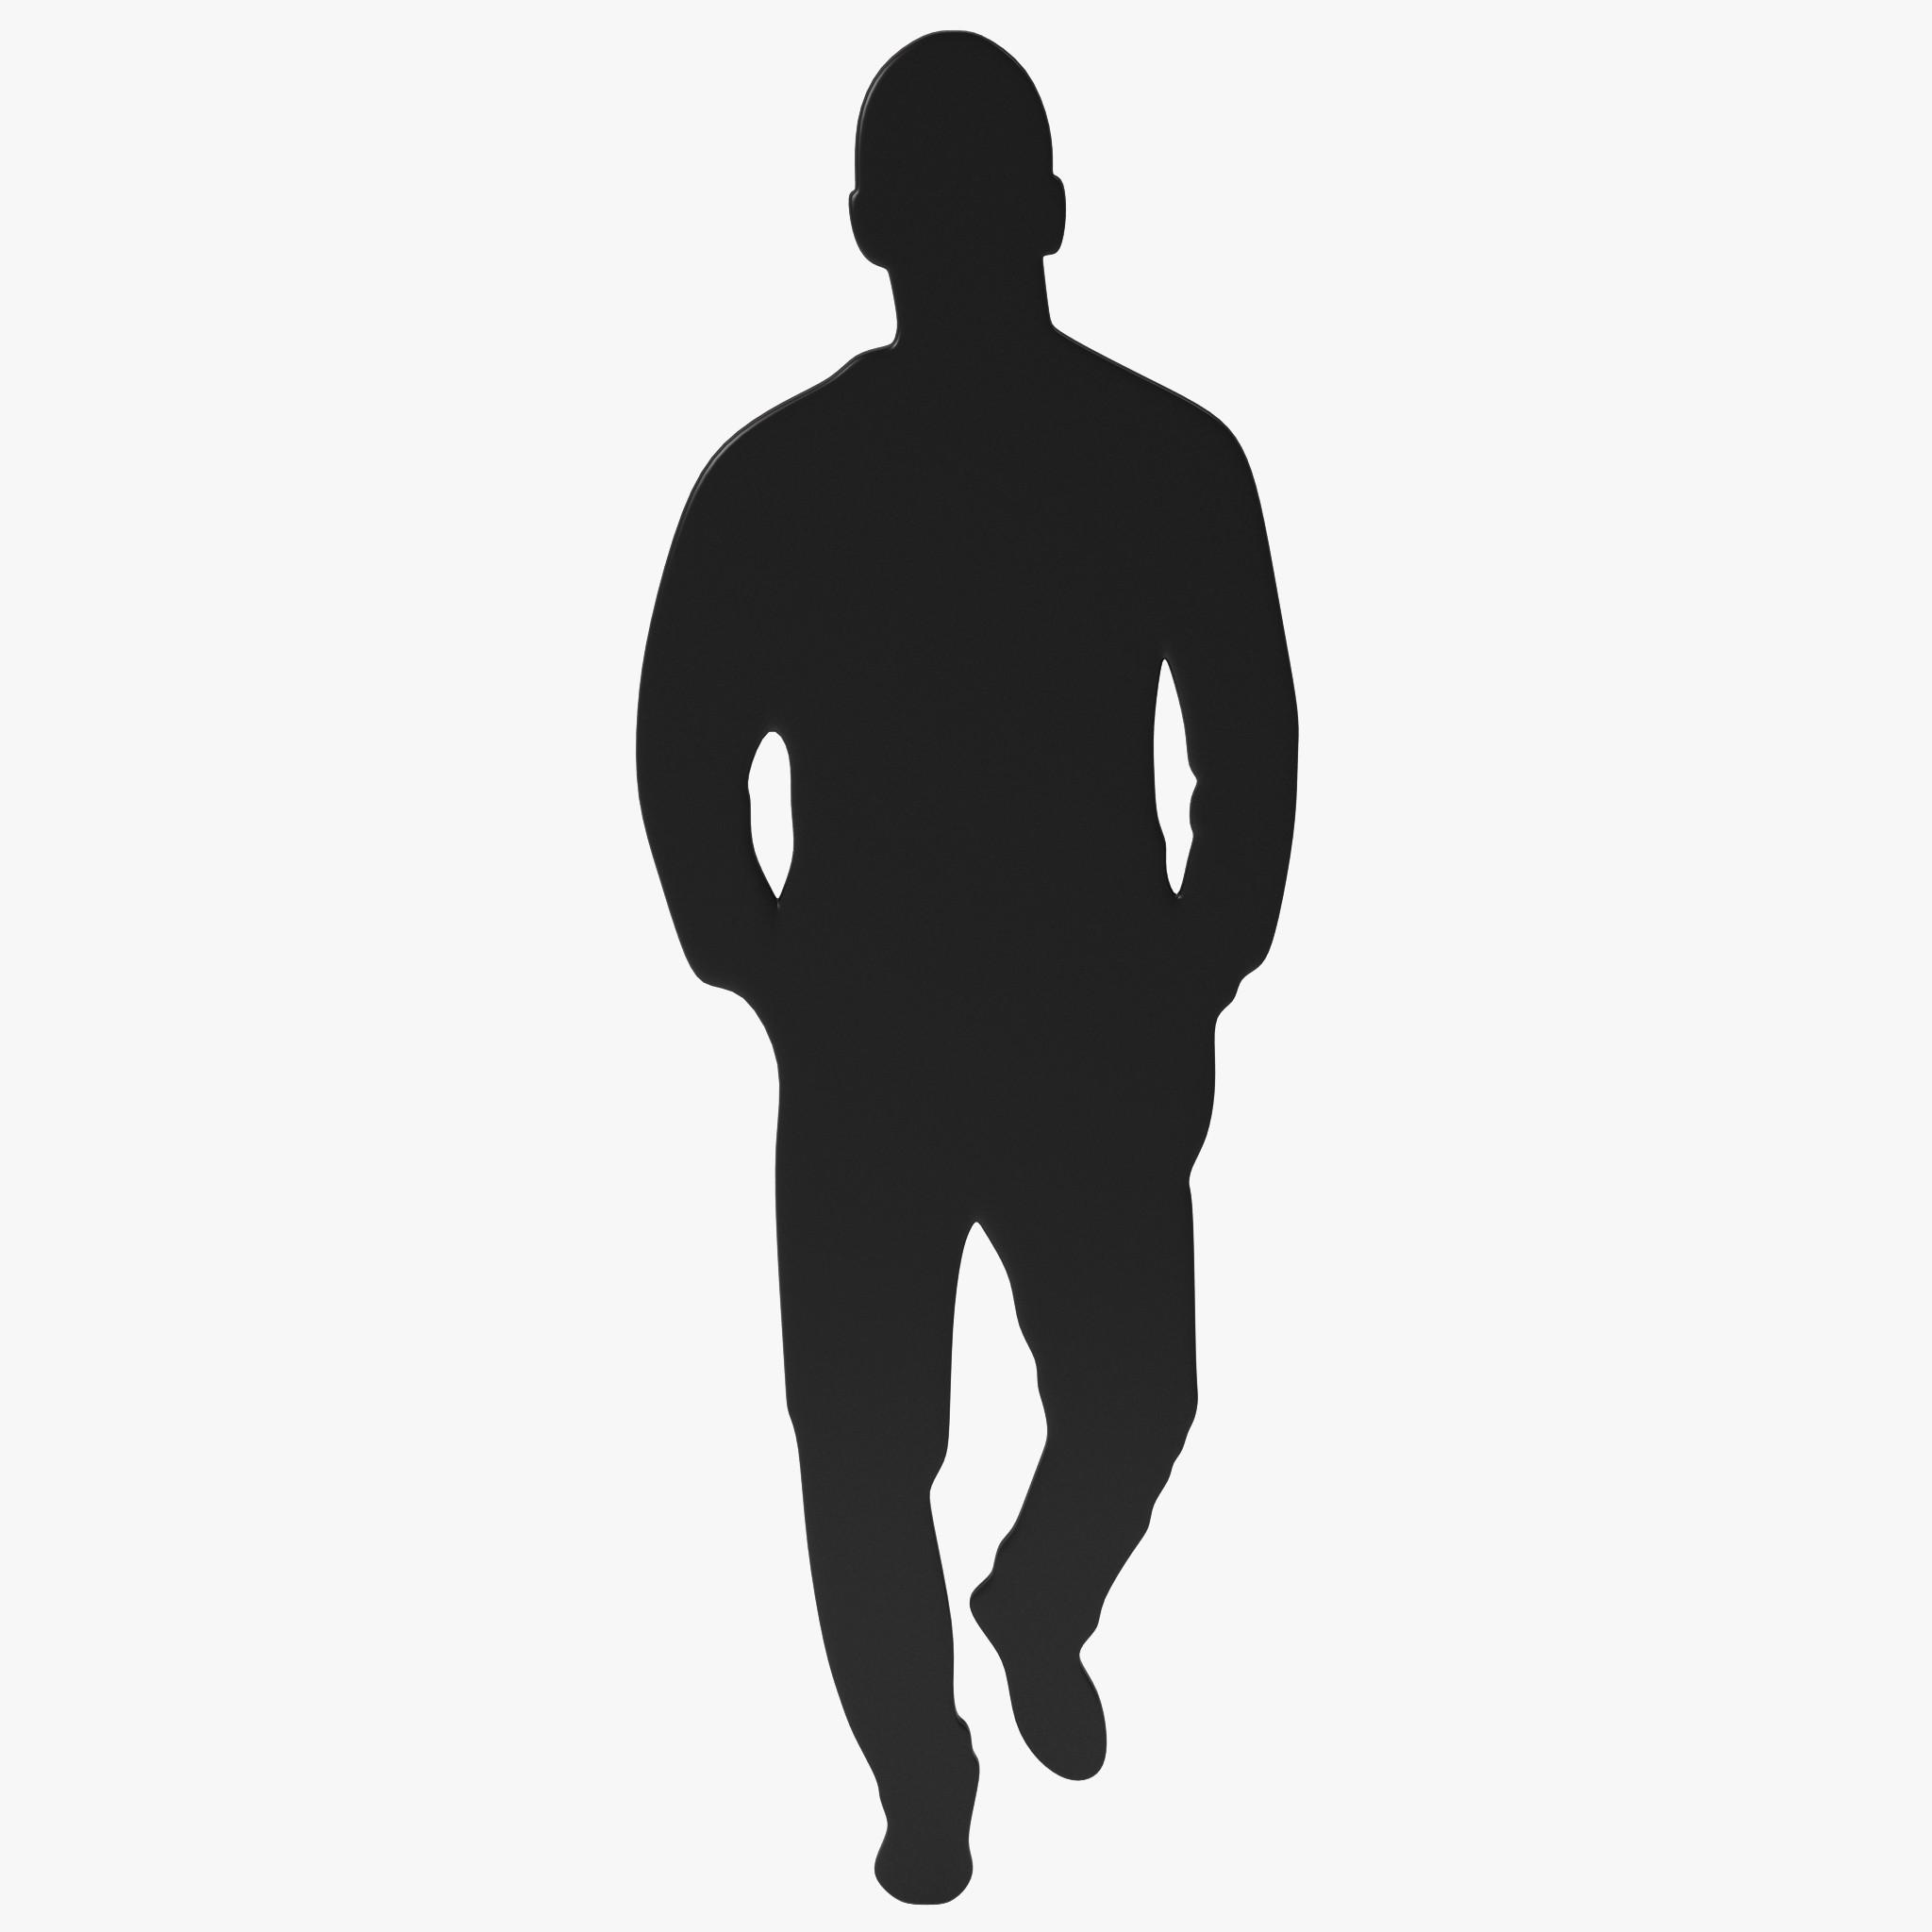 Free Person Silhouette, Download Free Clip Art, Free Clip.